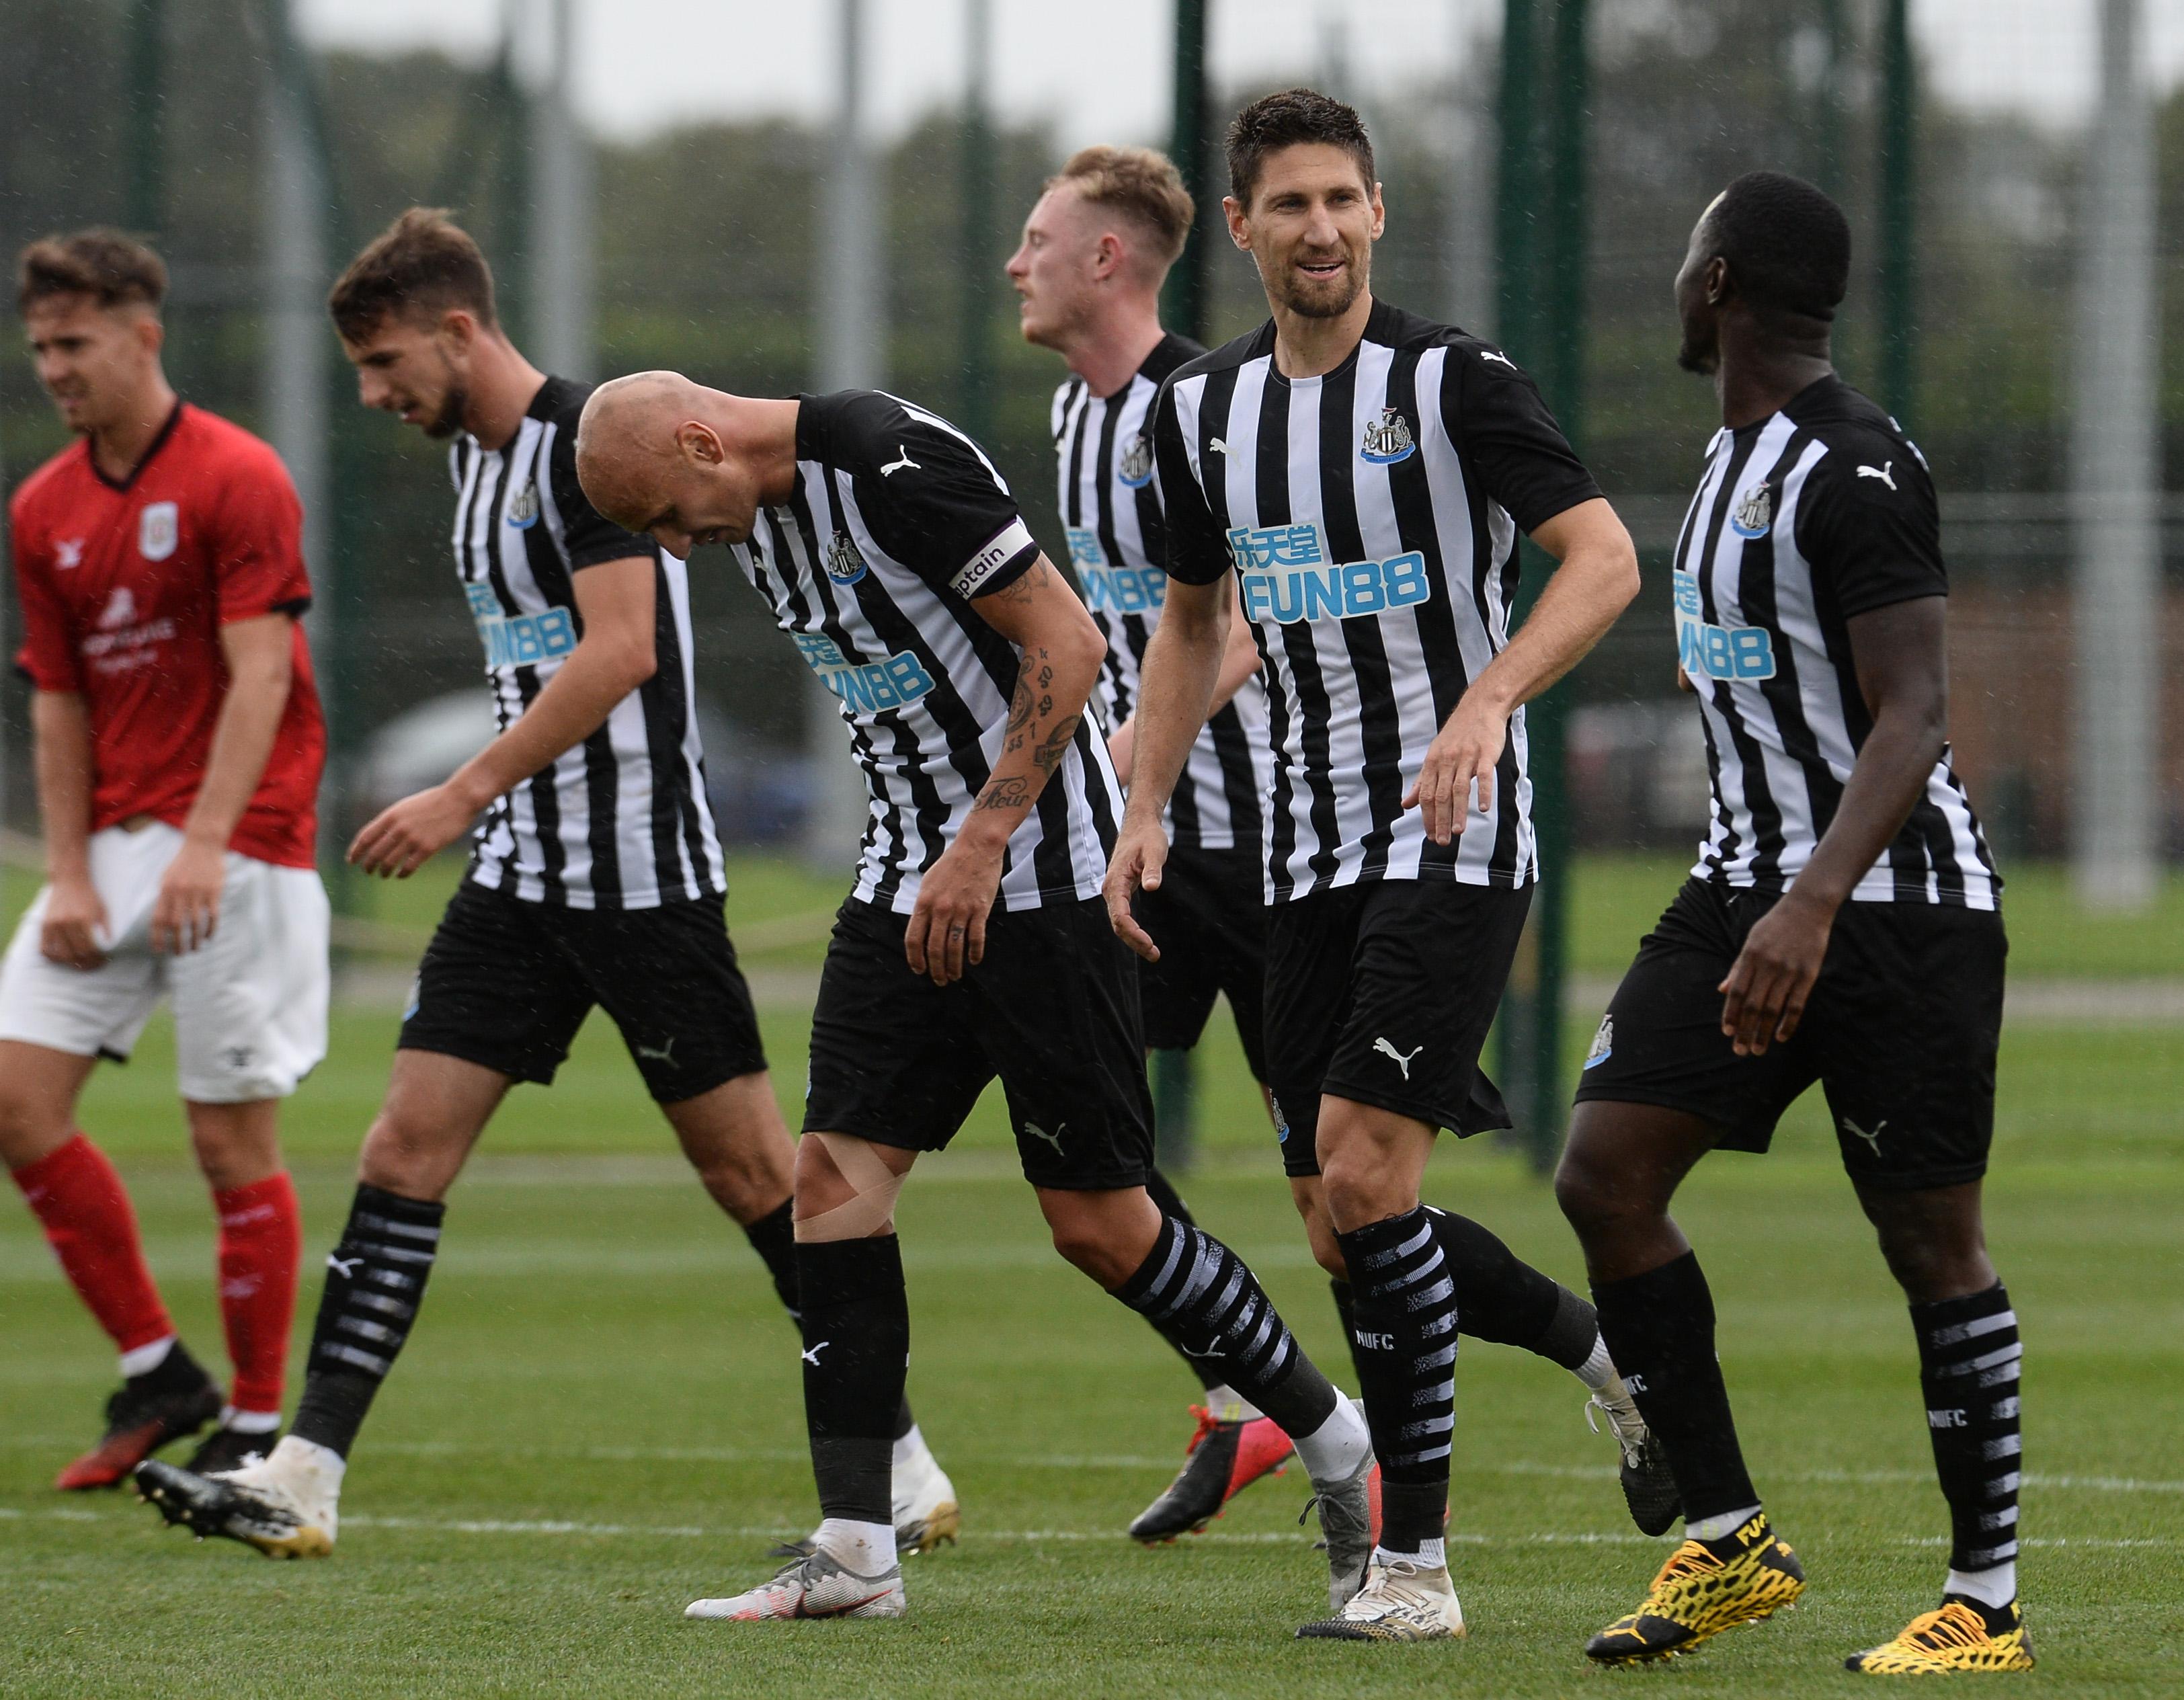 Newcastle United v Crewe Alexandra - Pre-Season Friendly